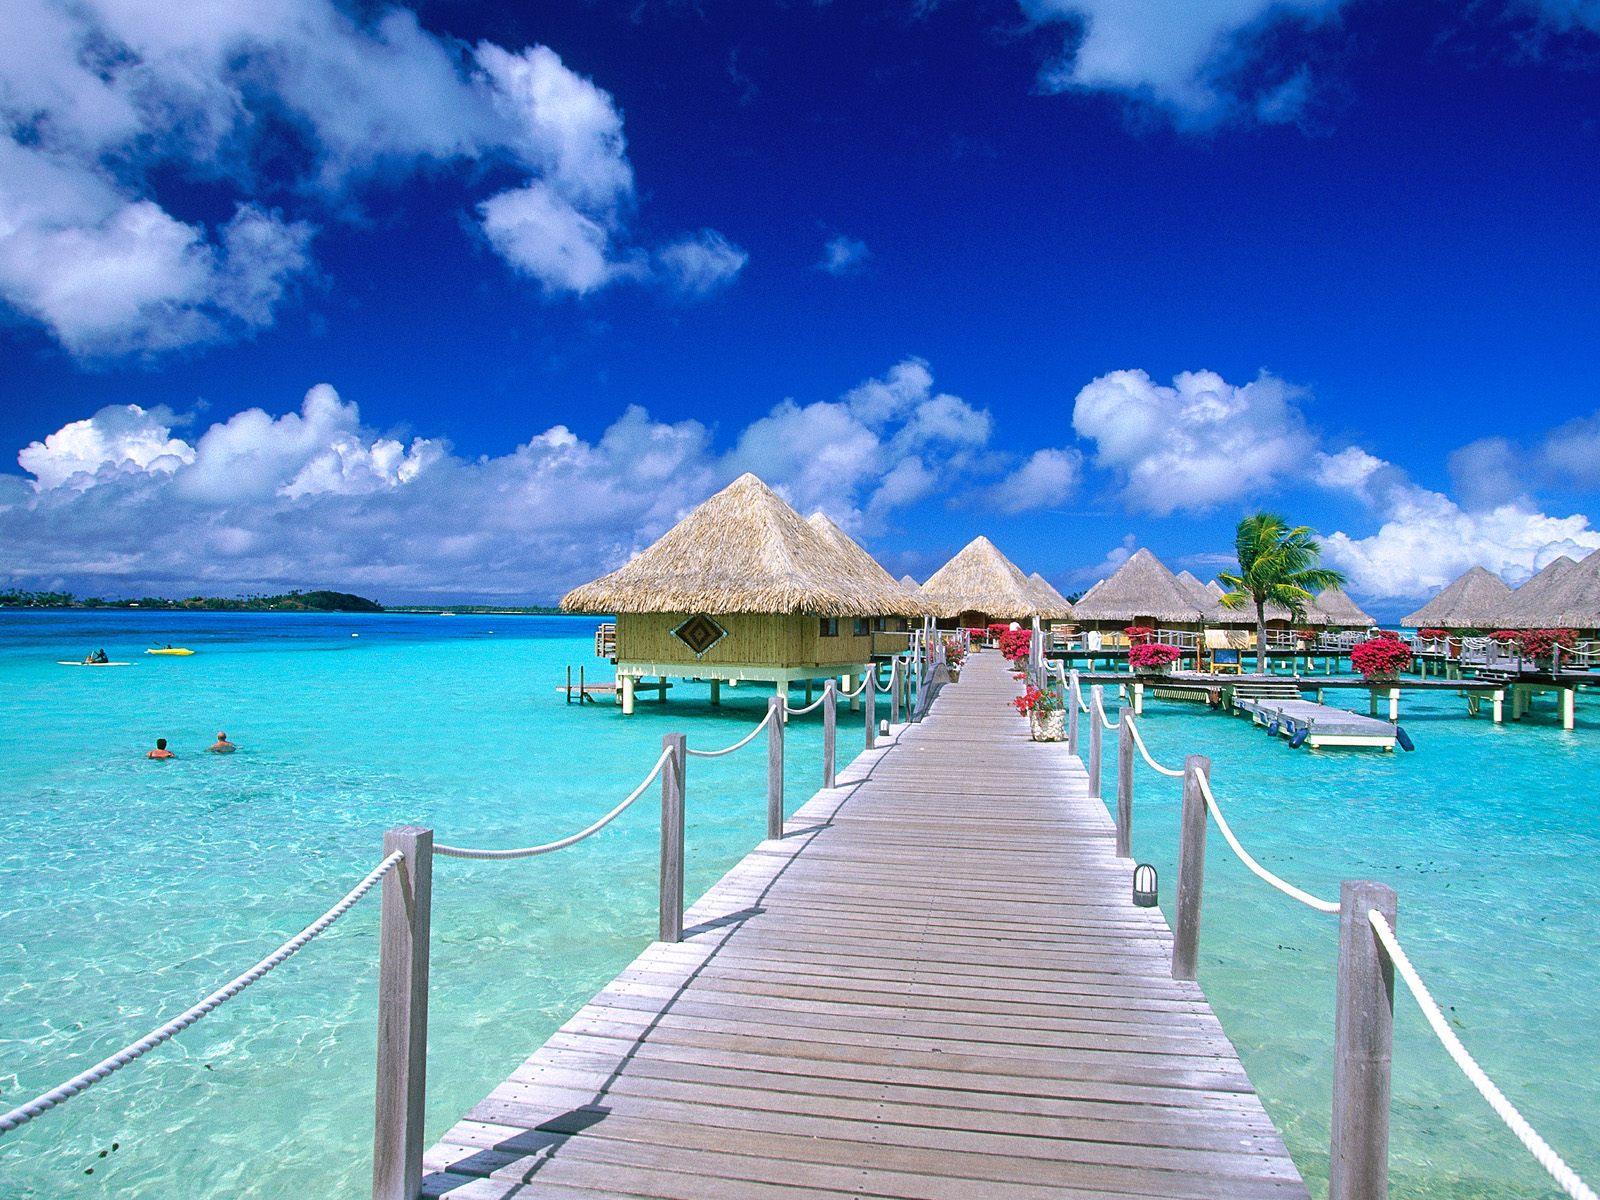 Tahiti Island Wallpapers HD Photos Beautiful Tourism Attractions 1600x1200